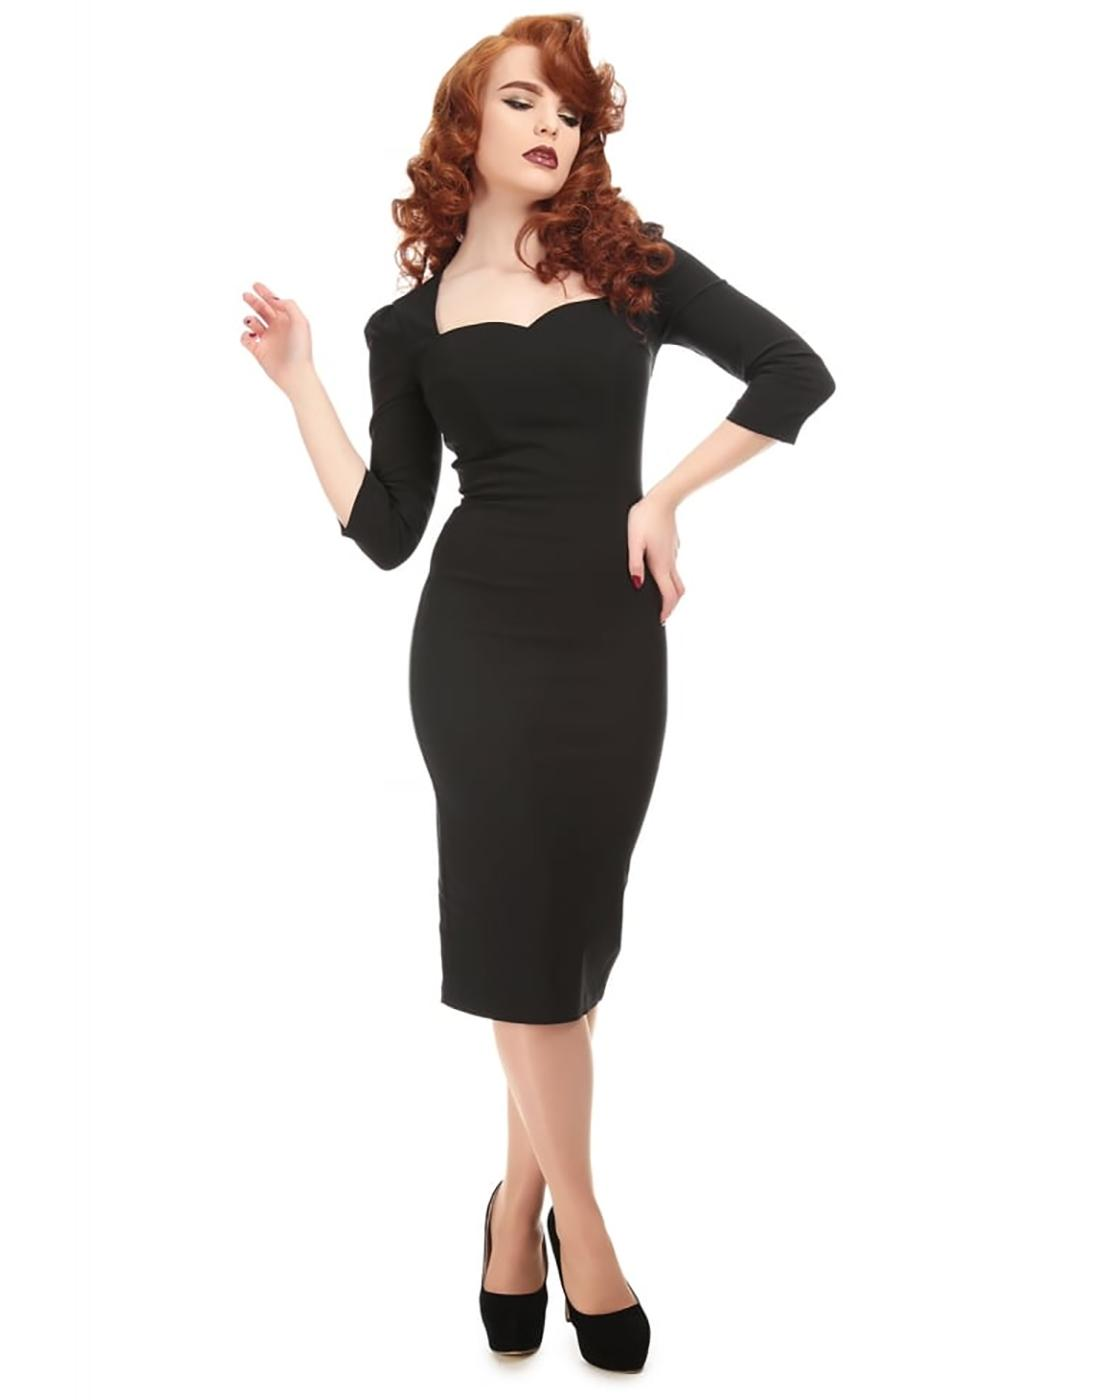 collectif vanessa vintage retro 50s pencil dress in black. Black Bedroom Furniture Sets. Home Design Ideas